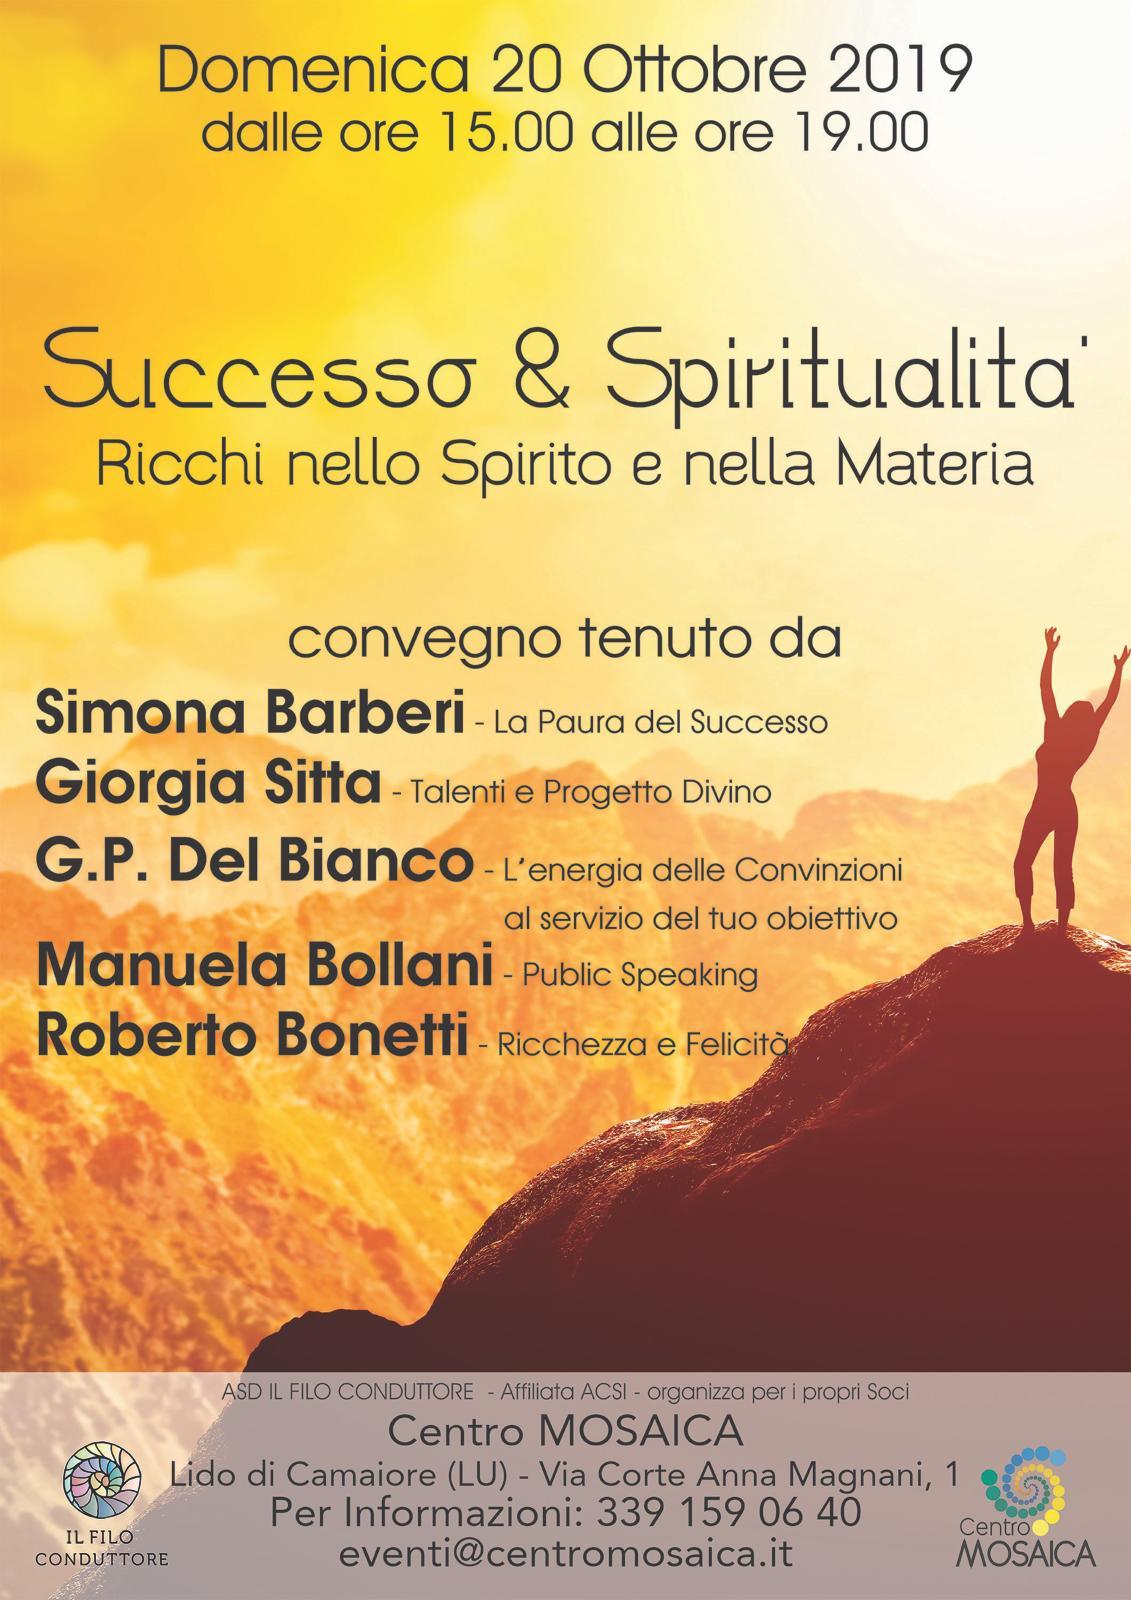 Successo & Spiritualità